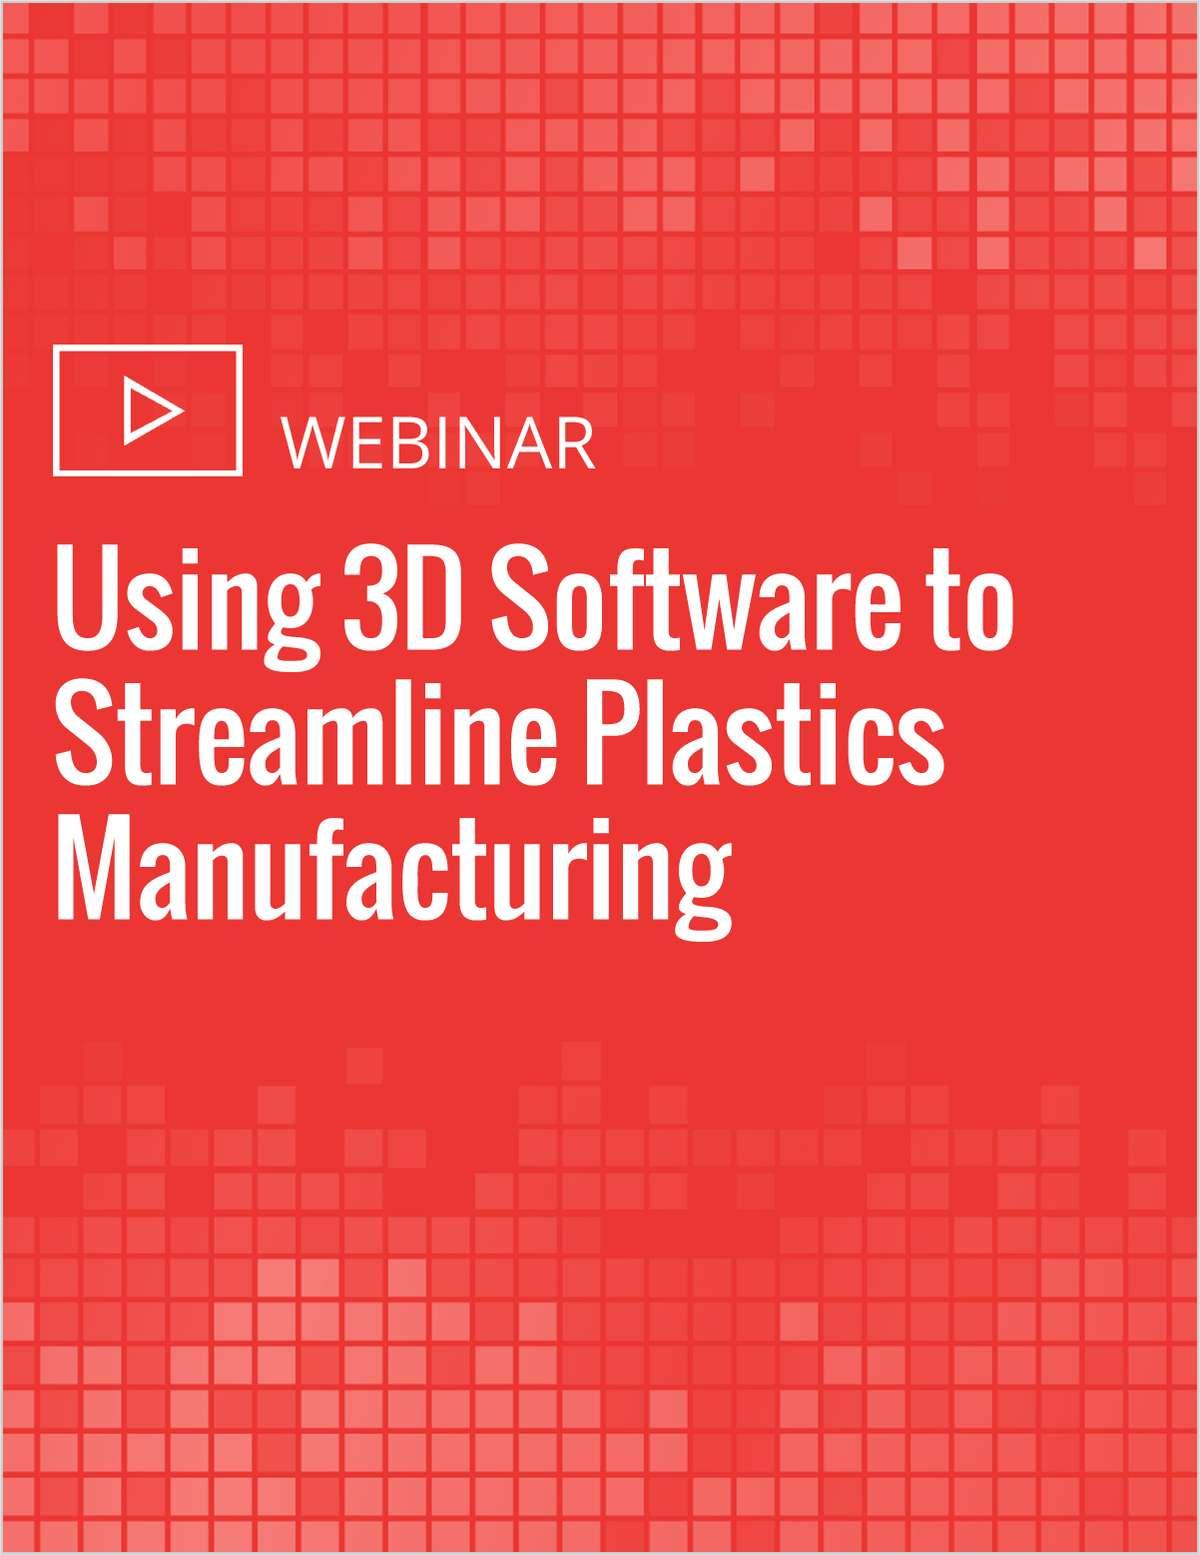 Using 3D Software to Streamline Plastics Manufacturing